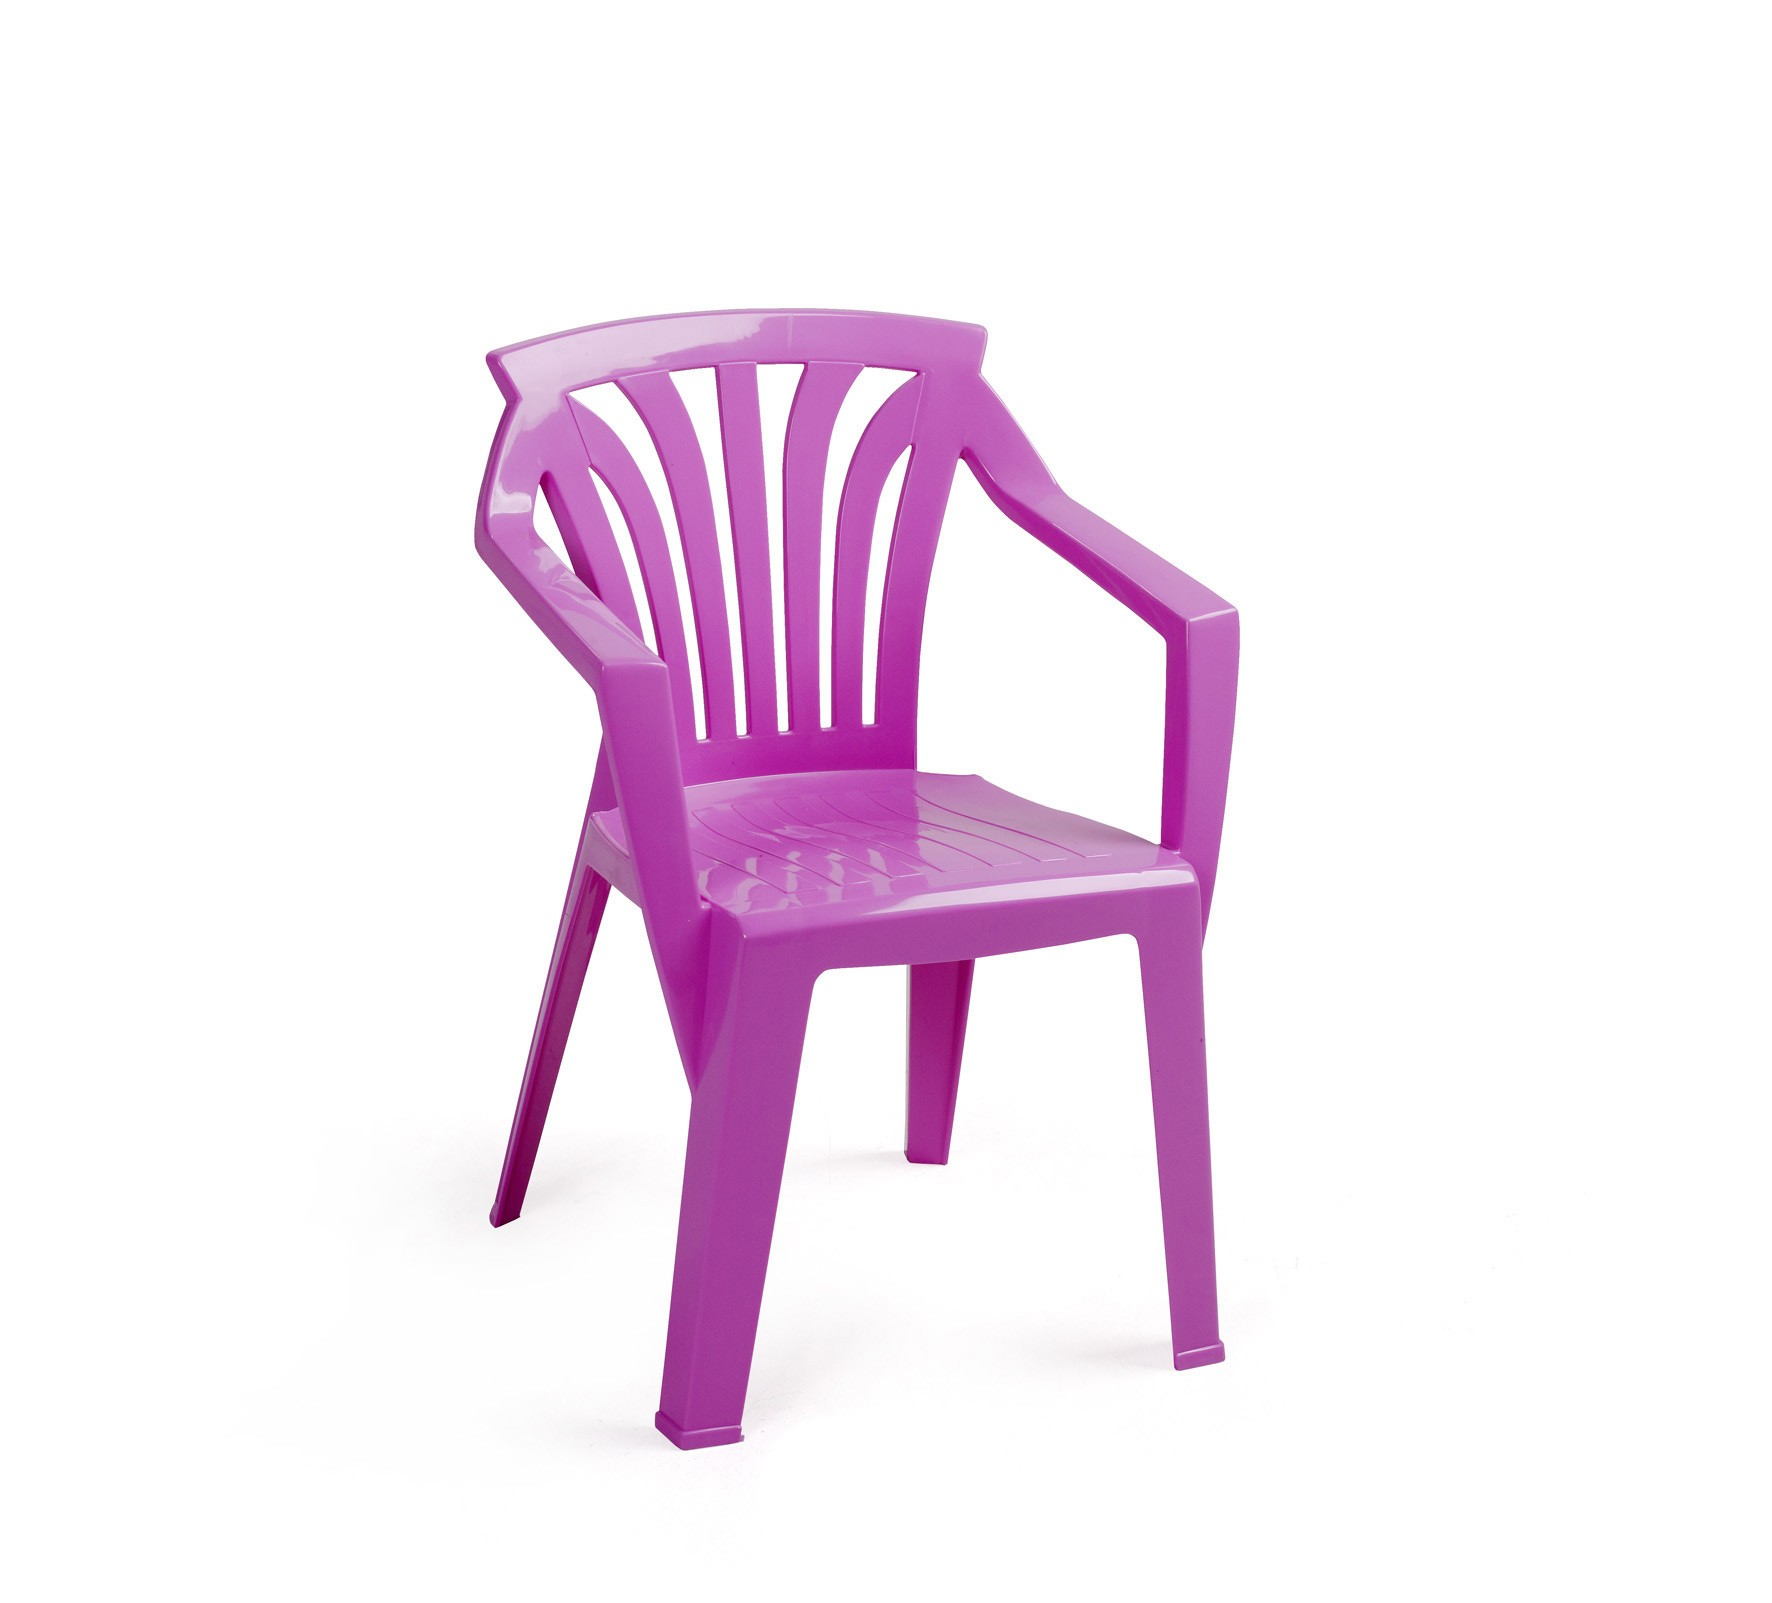 kinderstuhl gartenstuhl ariel kunststoff stapelbar nardi purple bei. Black Bedroom Furniture Sets. Home Design Ideas